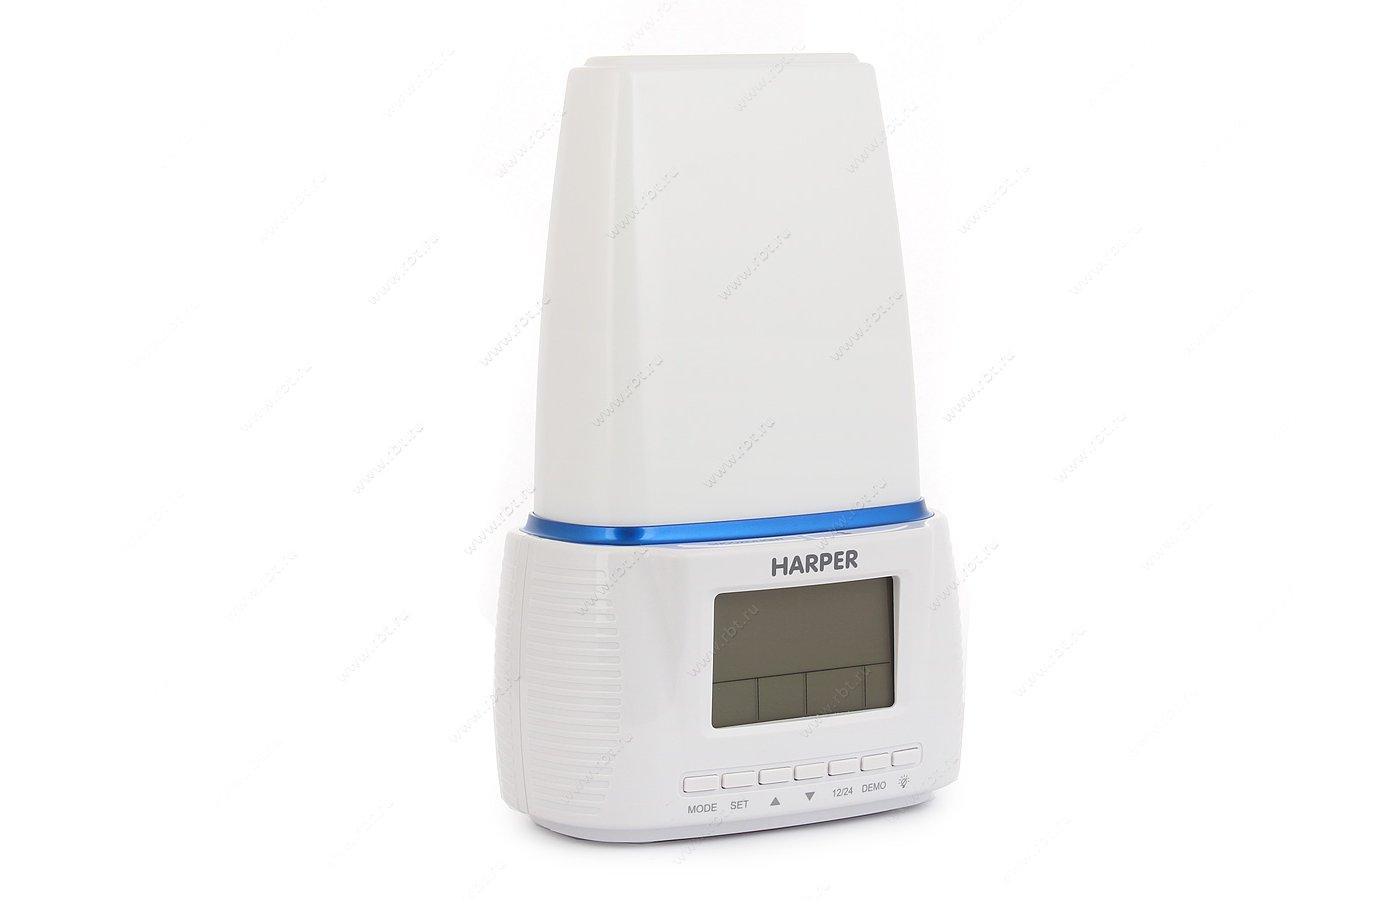 Настольные часы HARPER HWUL-878 Световой будильник